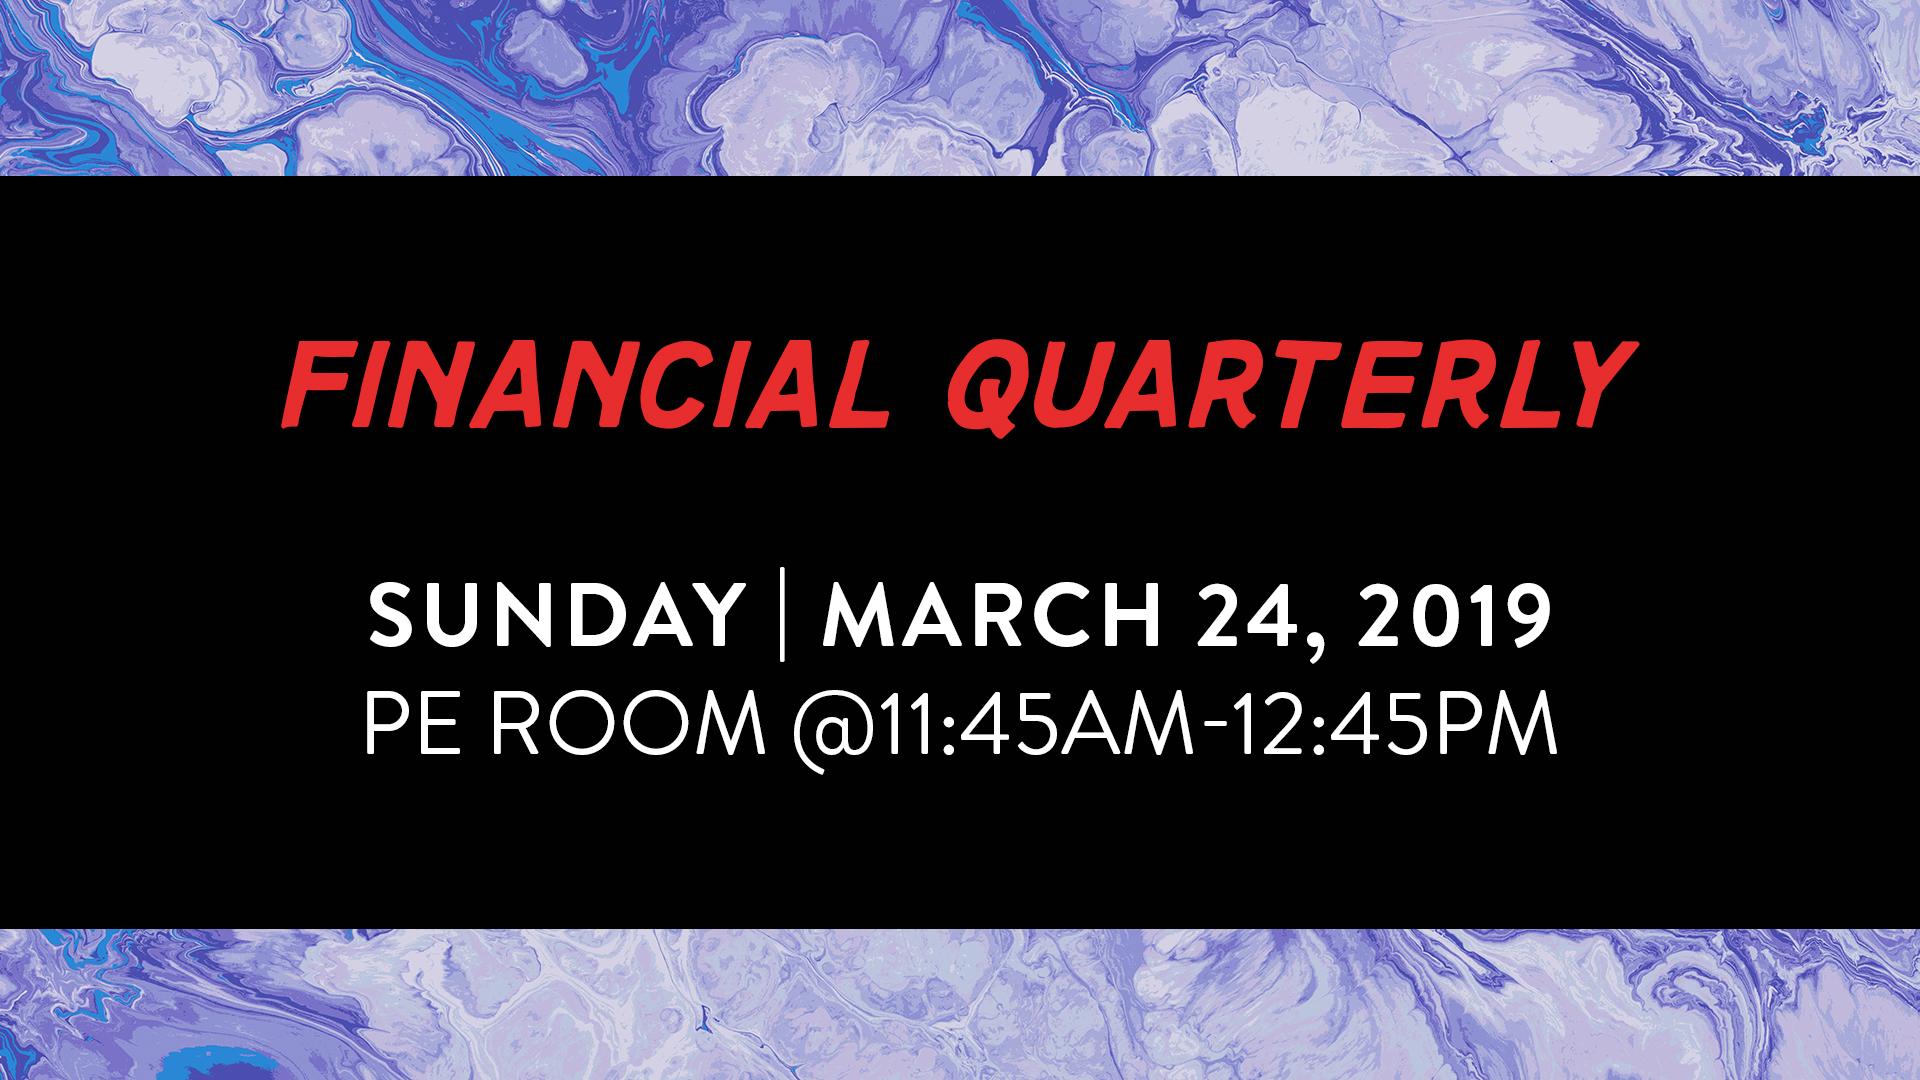 FinancialQuarterly_March.jpg